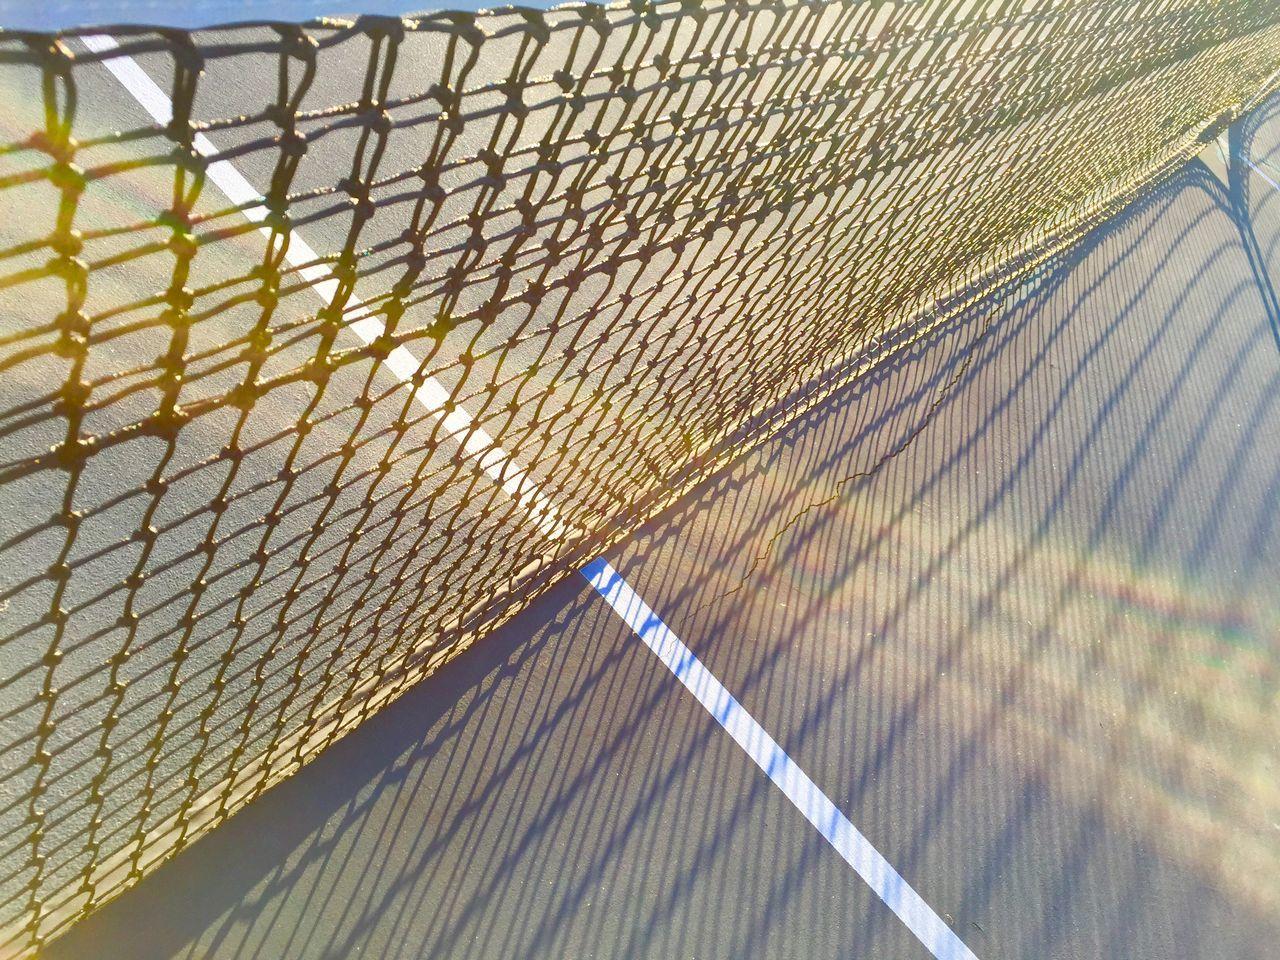 Close-up Day EyeEm New Here Lines Low Angle View No People Shadow Sun Glare Sun Rays Tennis Tennis Court Tennis Net Tenniscourt